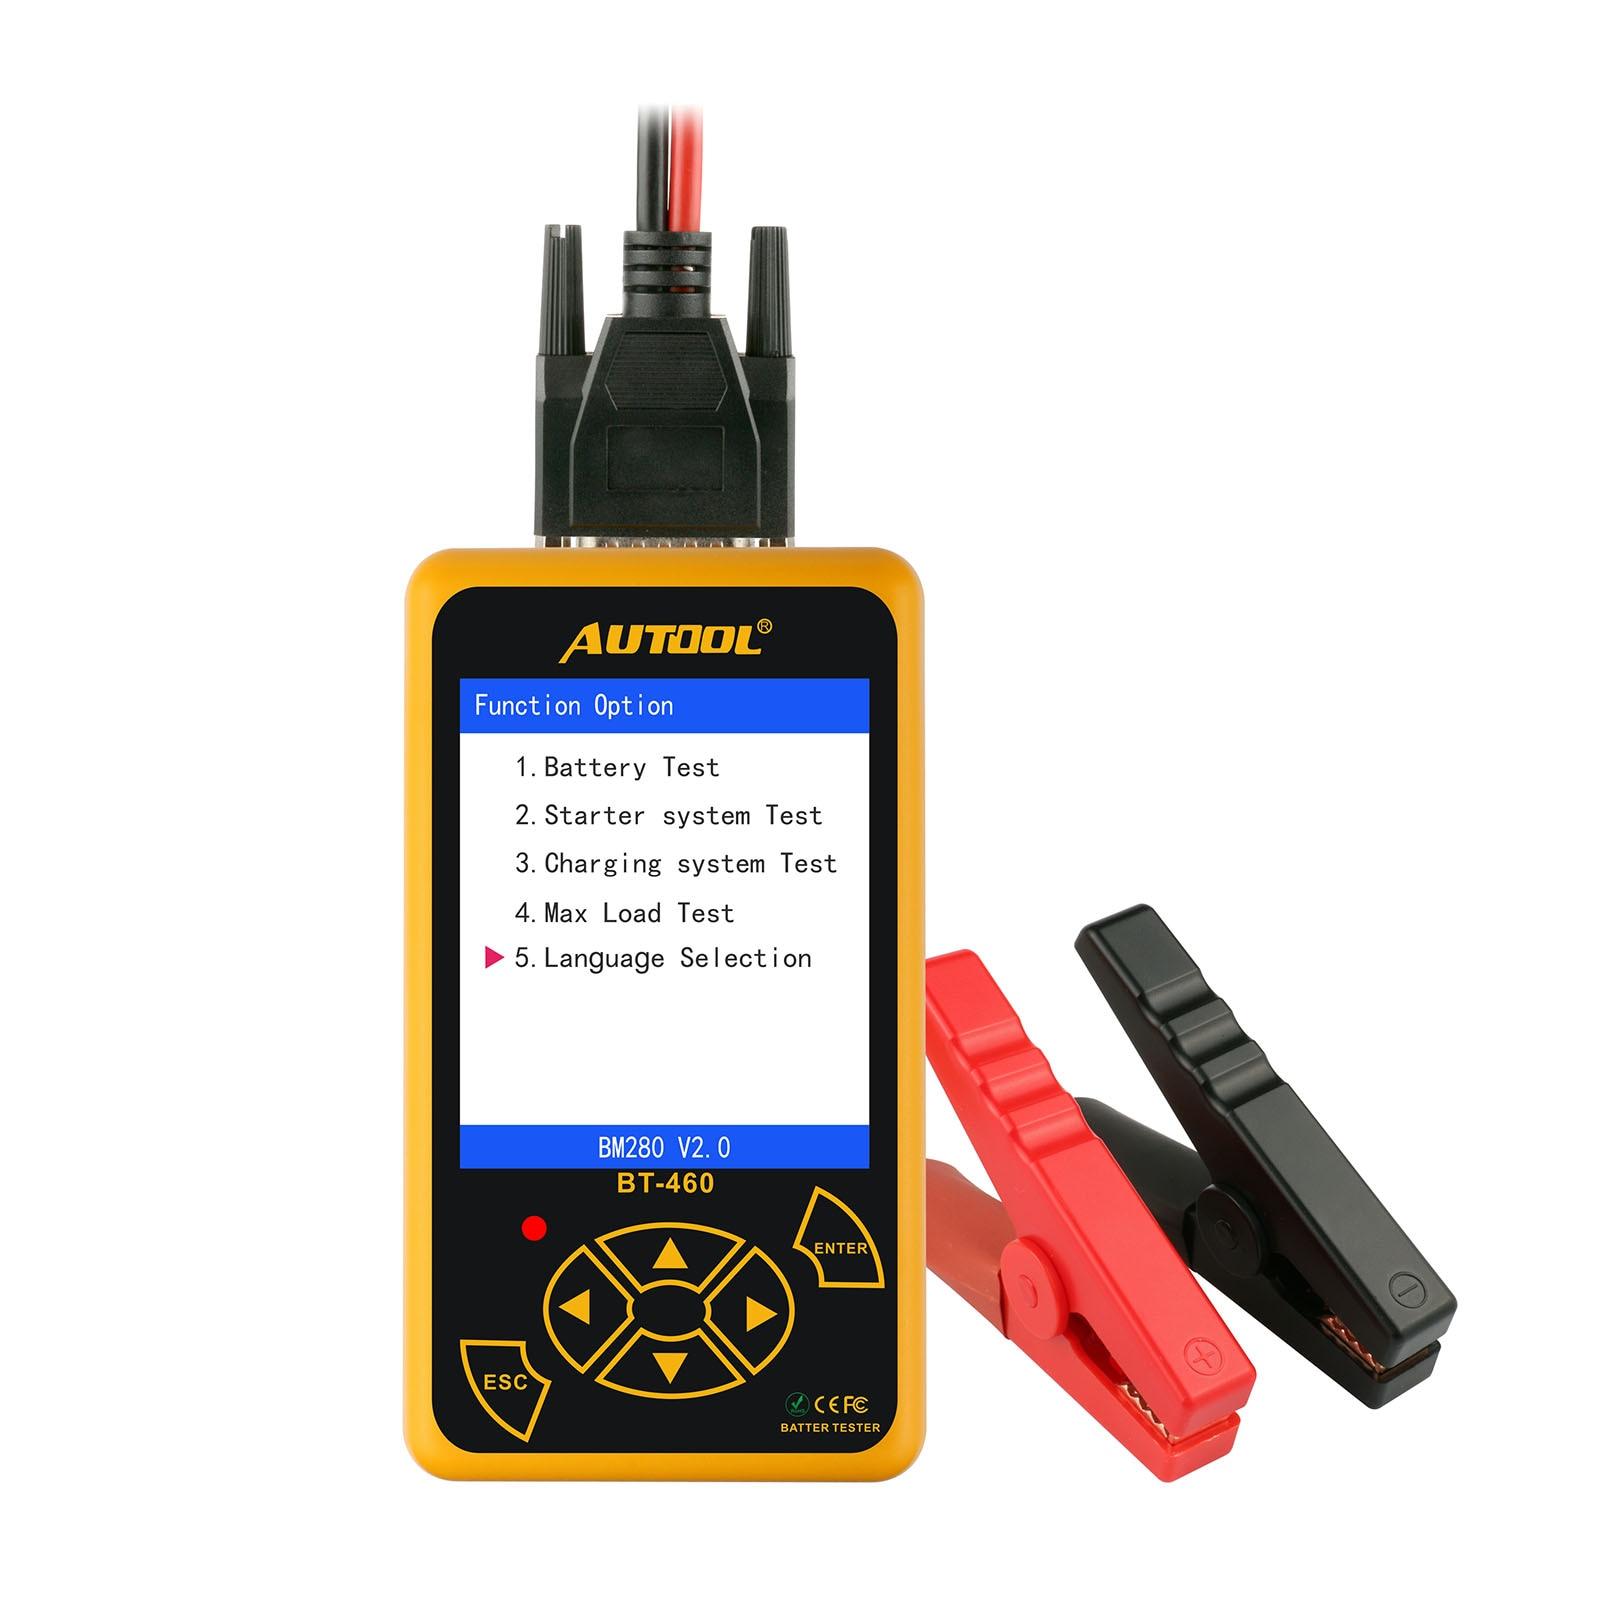 AUTOOL BT-460 Battery Tester Cell Analyzer 24V 12V Vehicle Diagnostic Tool Vehicle Lead-acid AGM GEL TFT Colorful Display цена